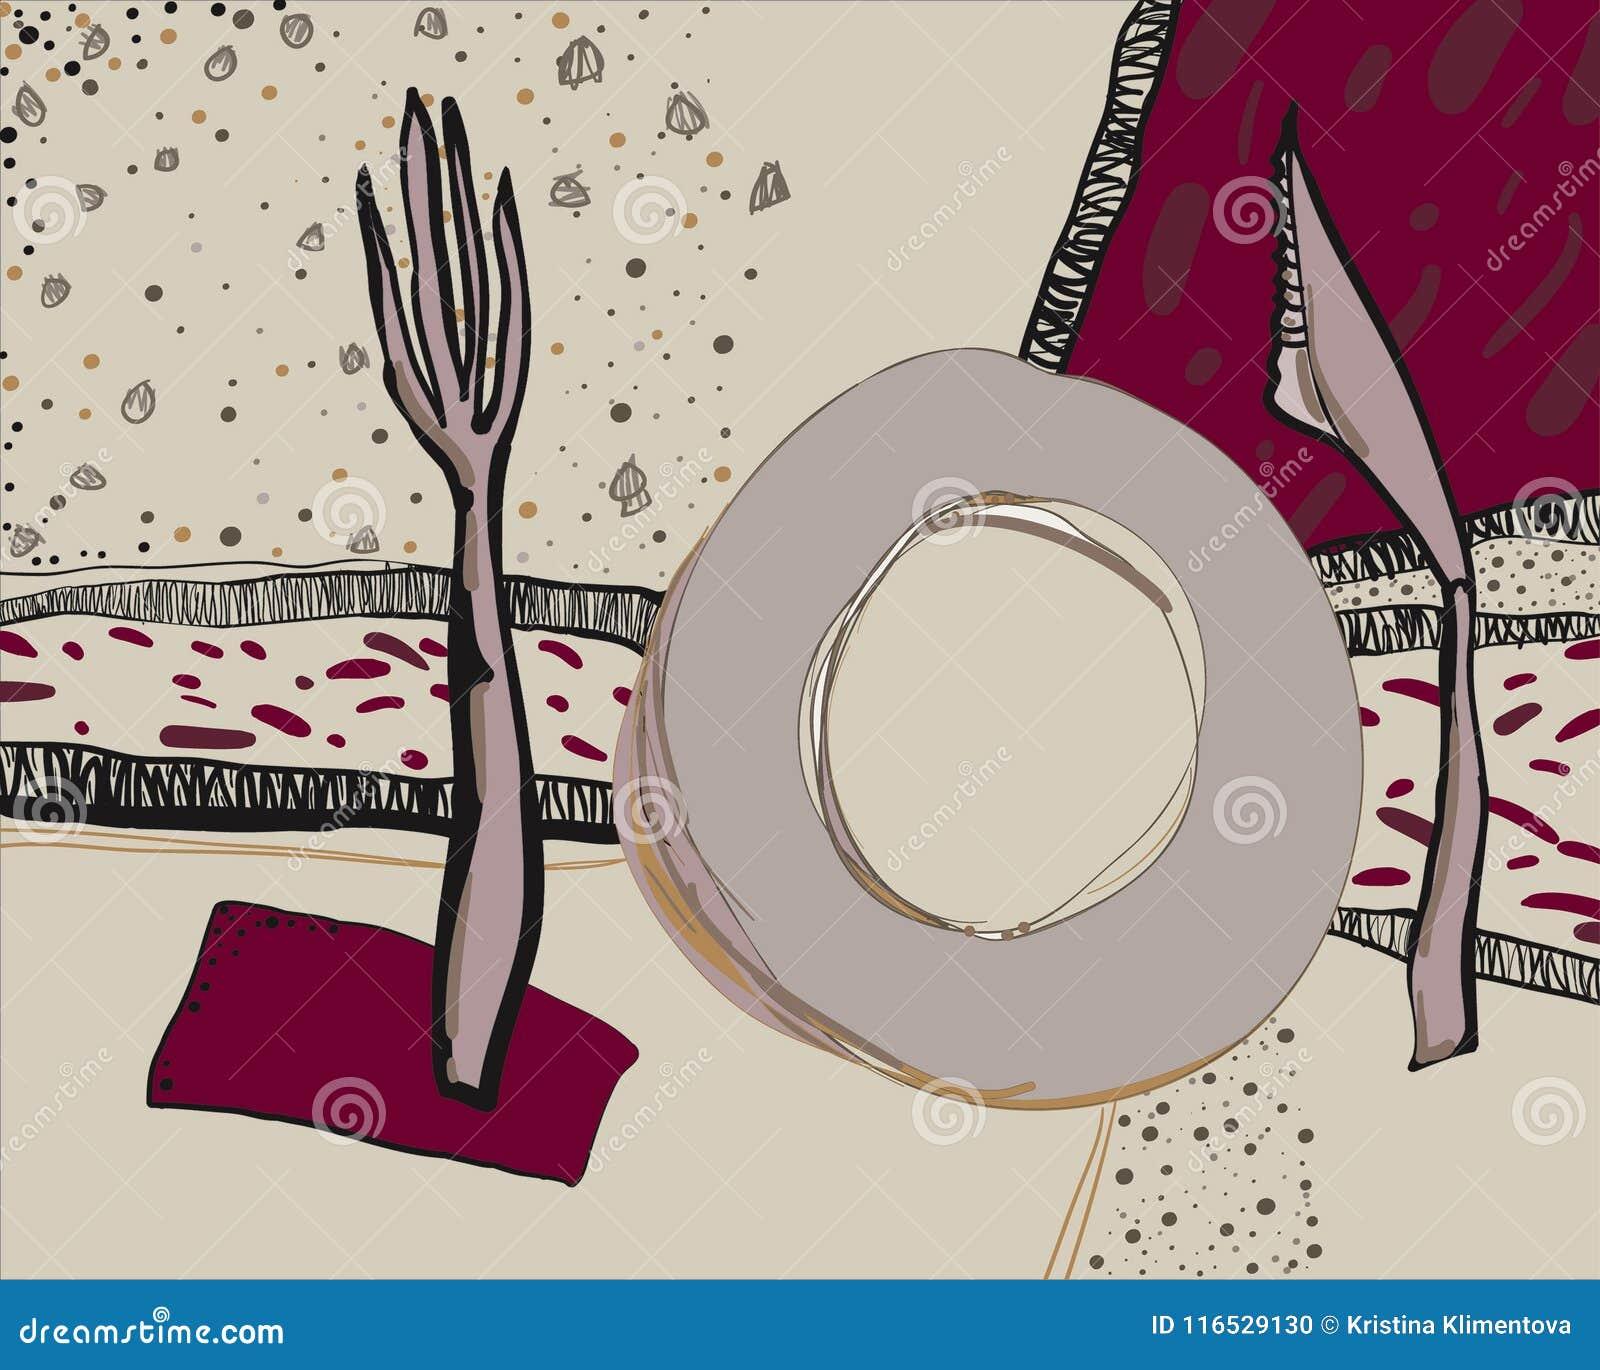 Tableware hand drawn vector illustration. Decorative doodle of kitchen utensils.